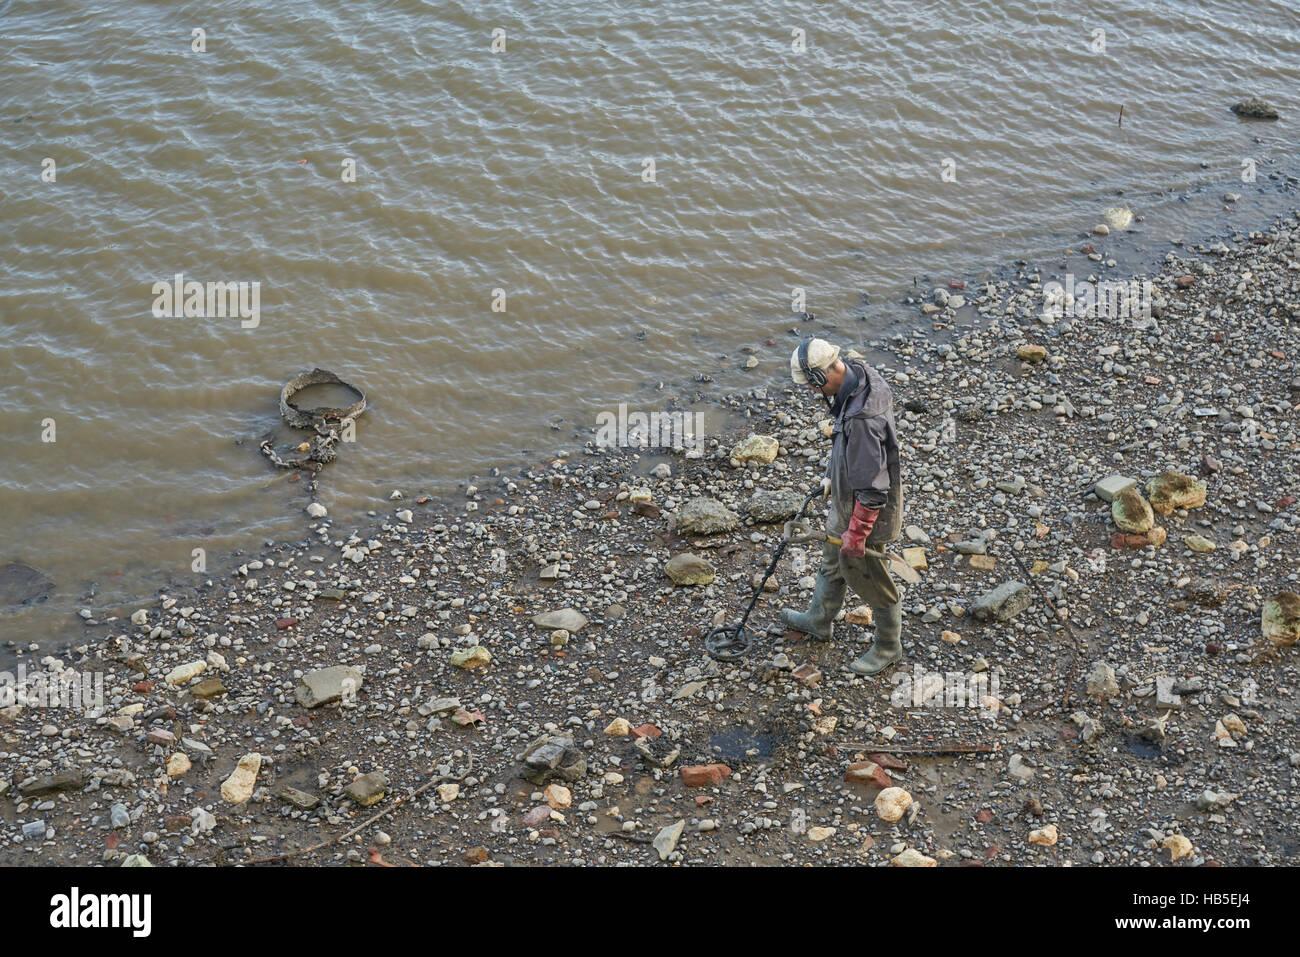 metal detectoring on river.  Metal detector.  Thames Mudlarking - Stock Image